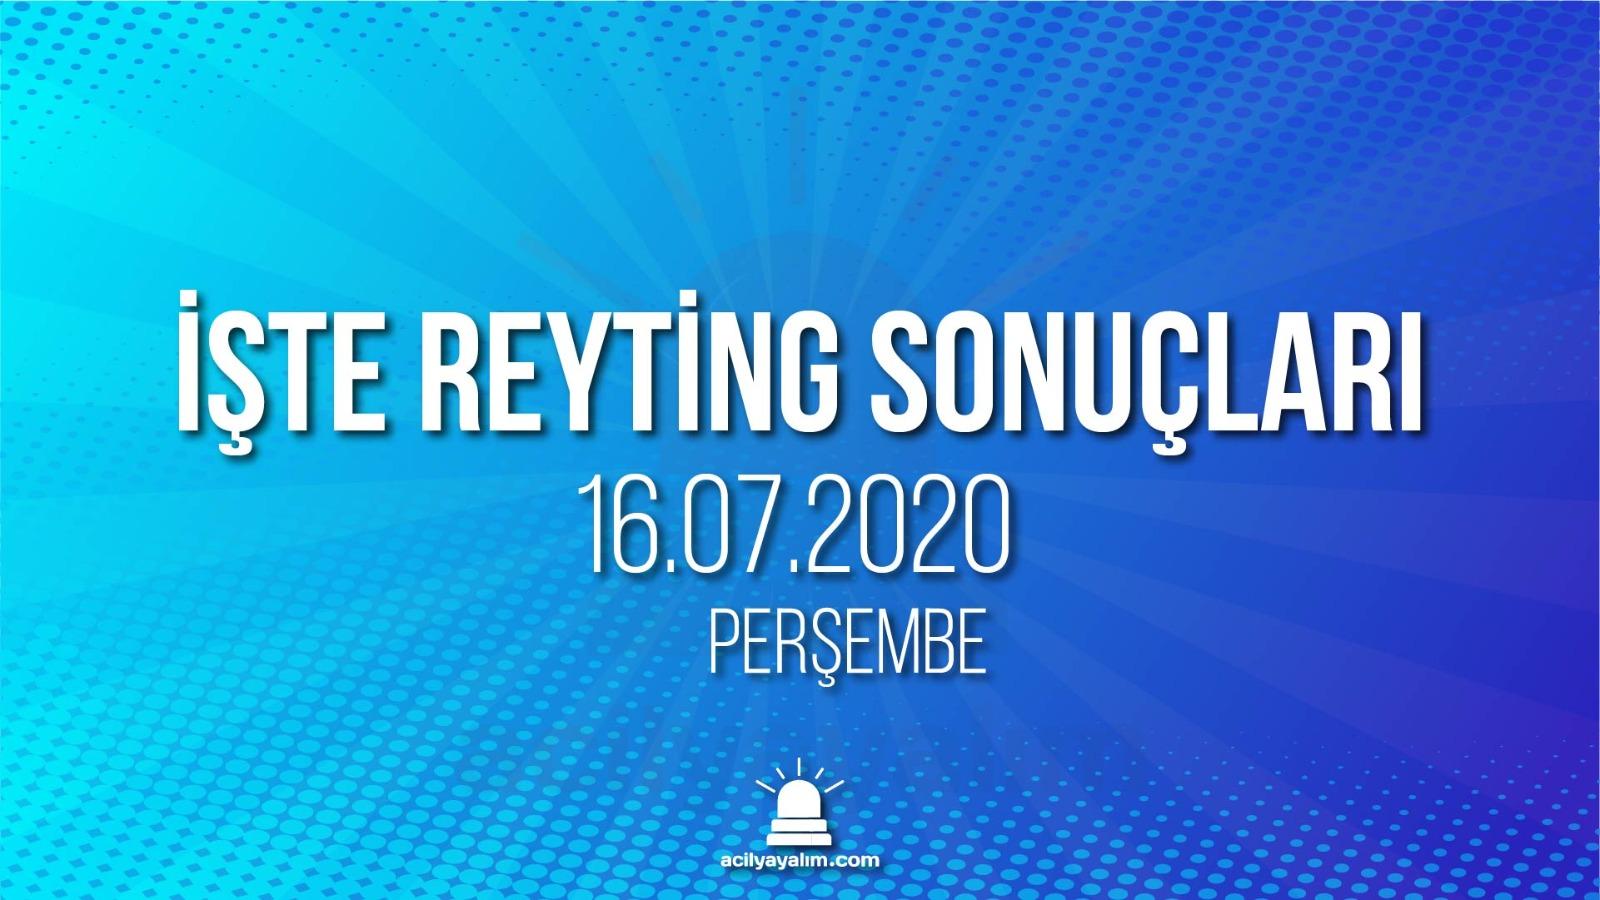 16 Temmuz 2020 Perşembe reyting sonuçları